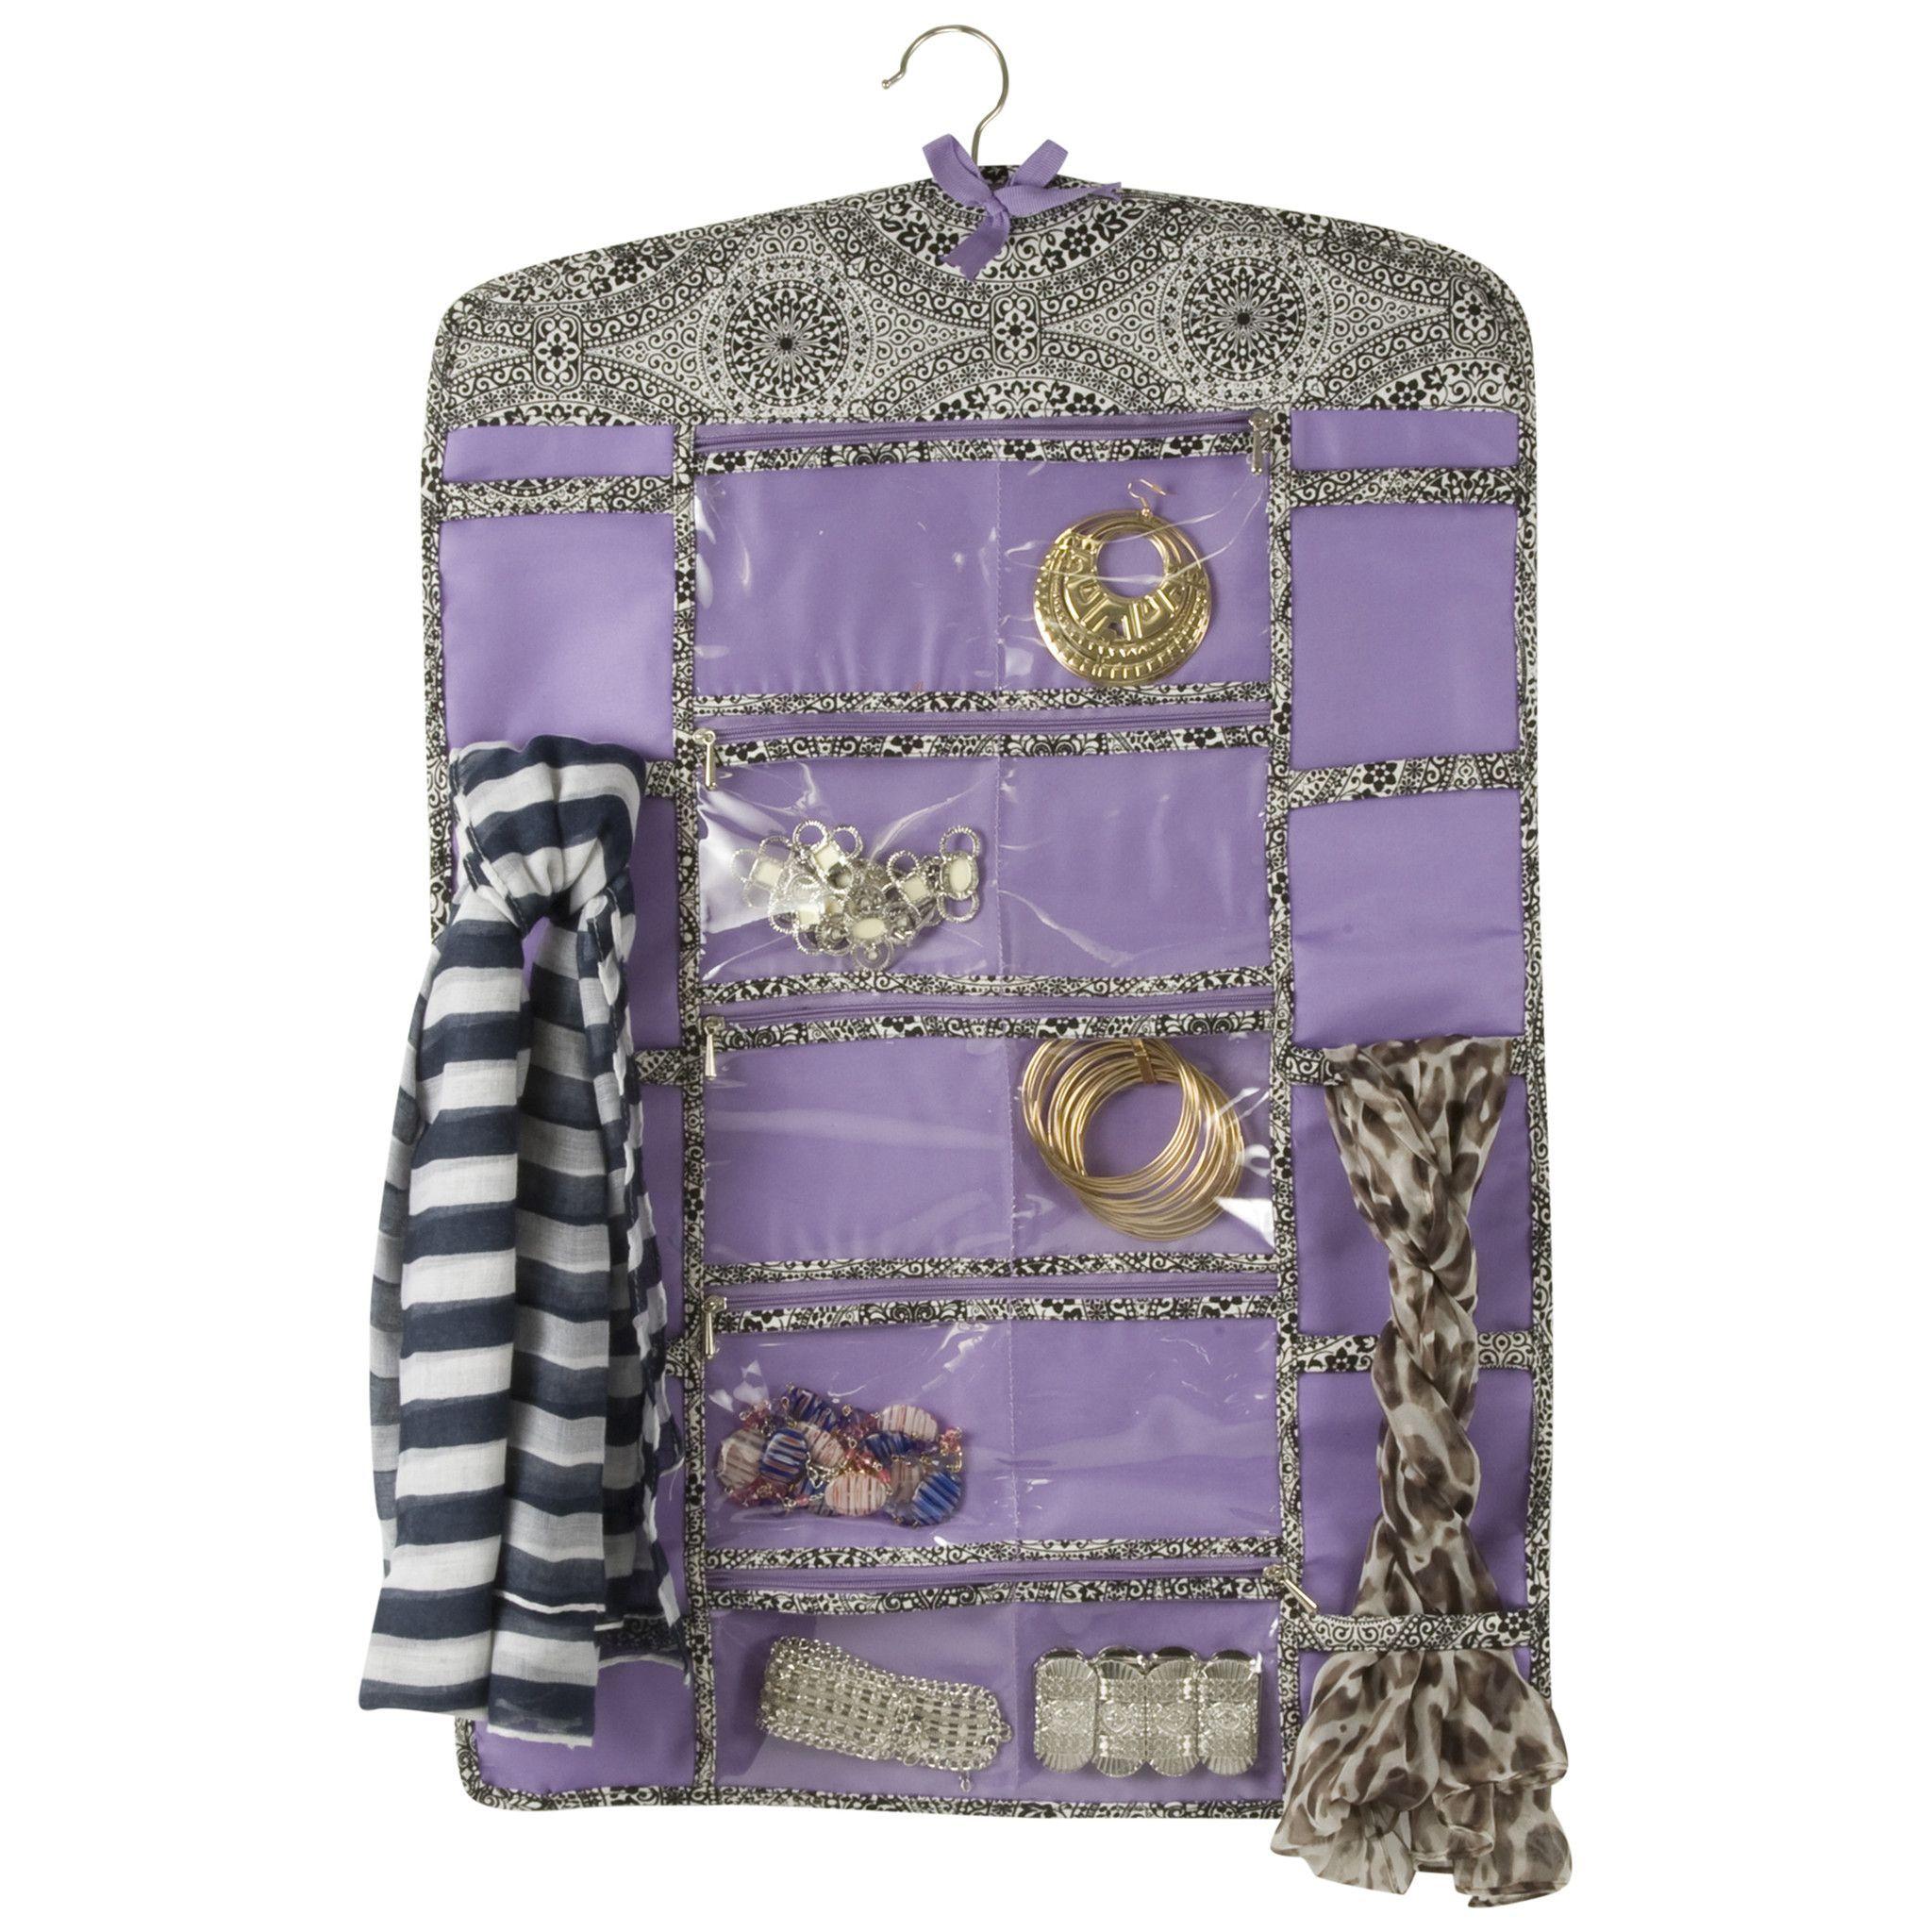 20 Zippered Compartment Hanging Jewelry Storage Scarf Organizer